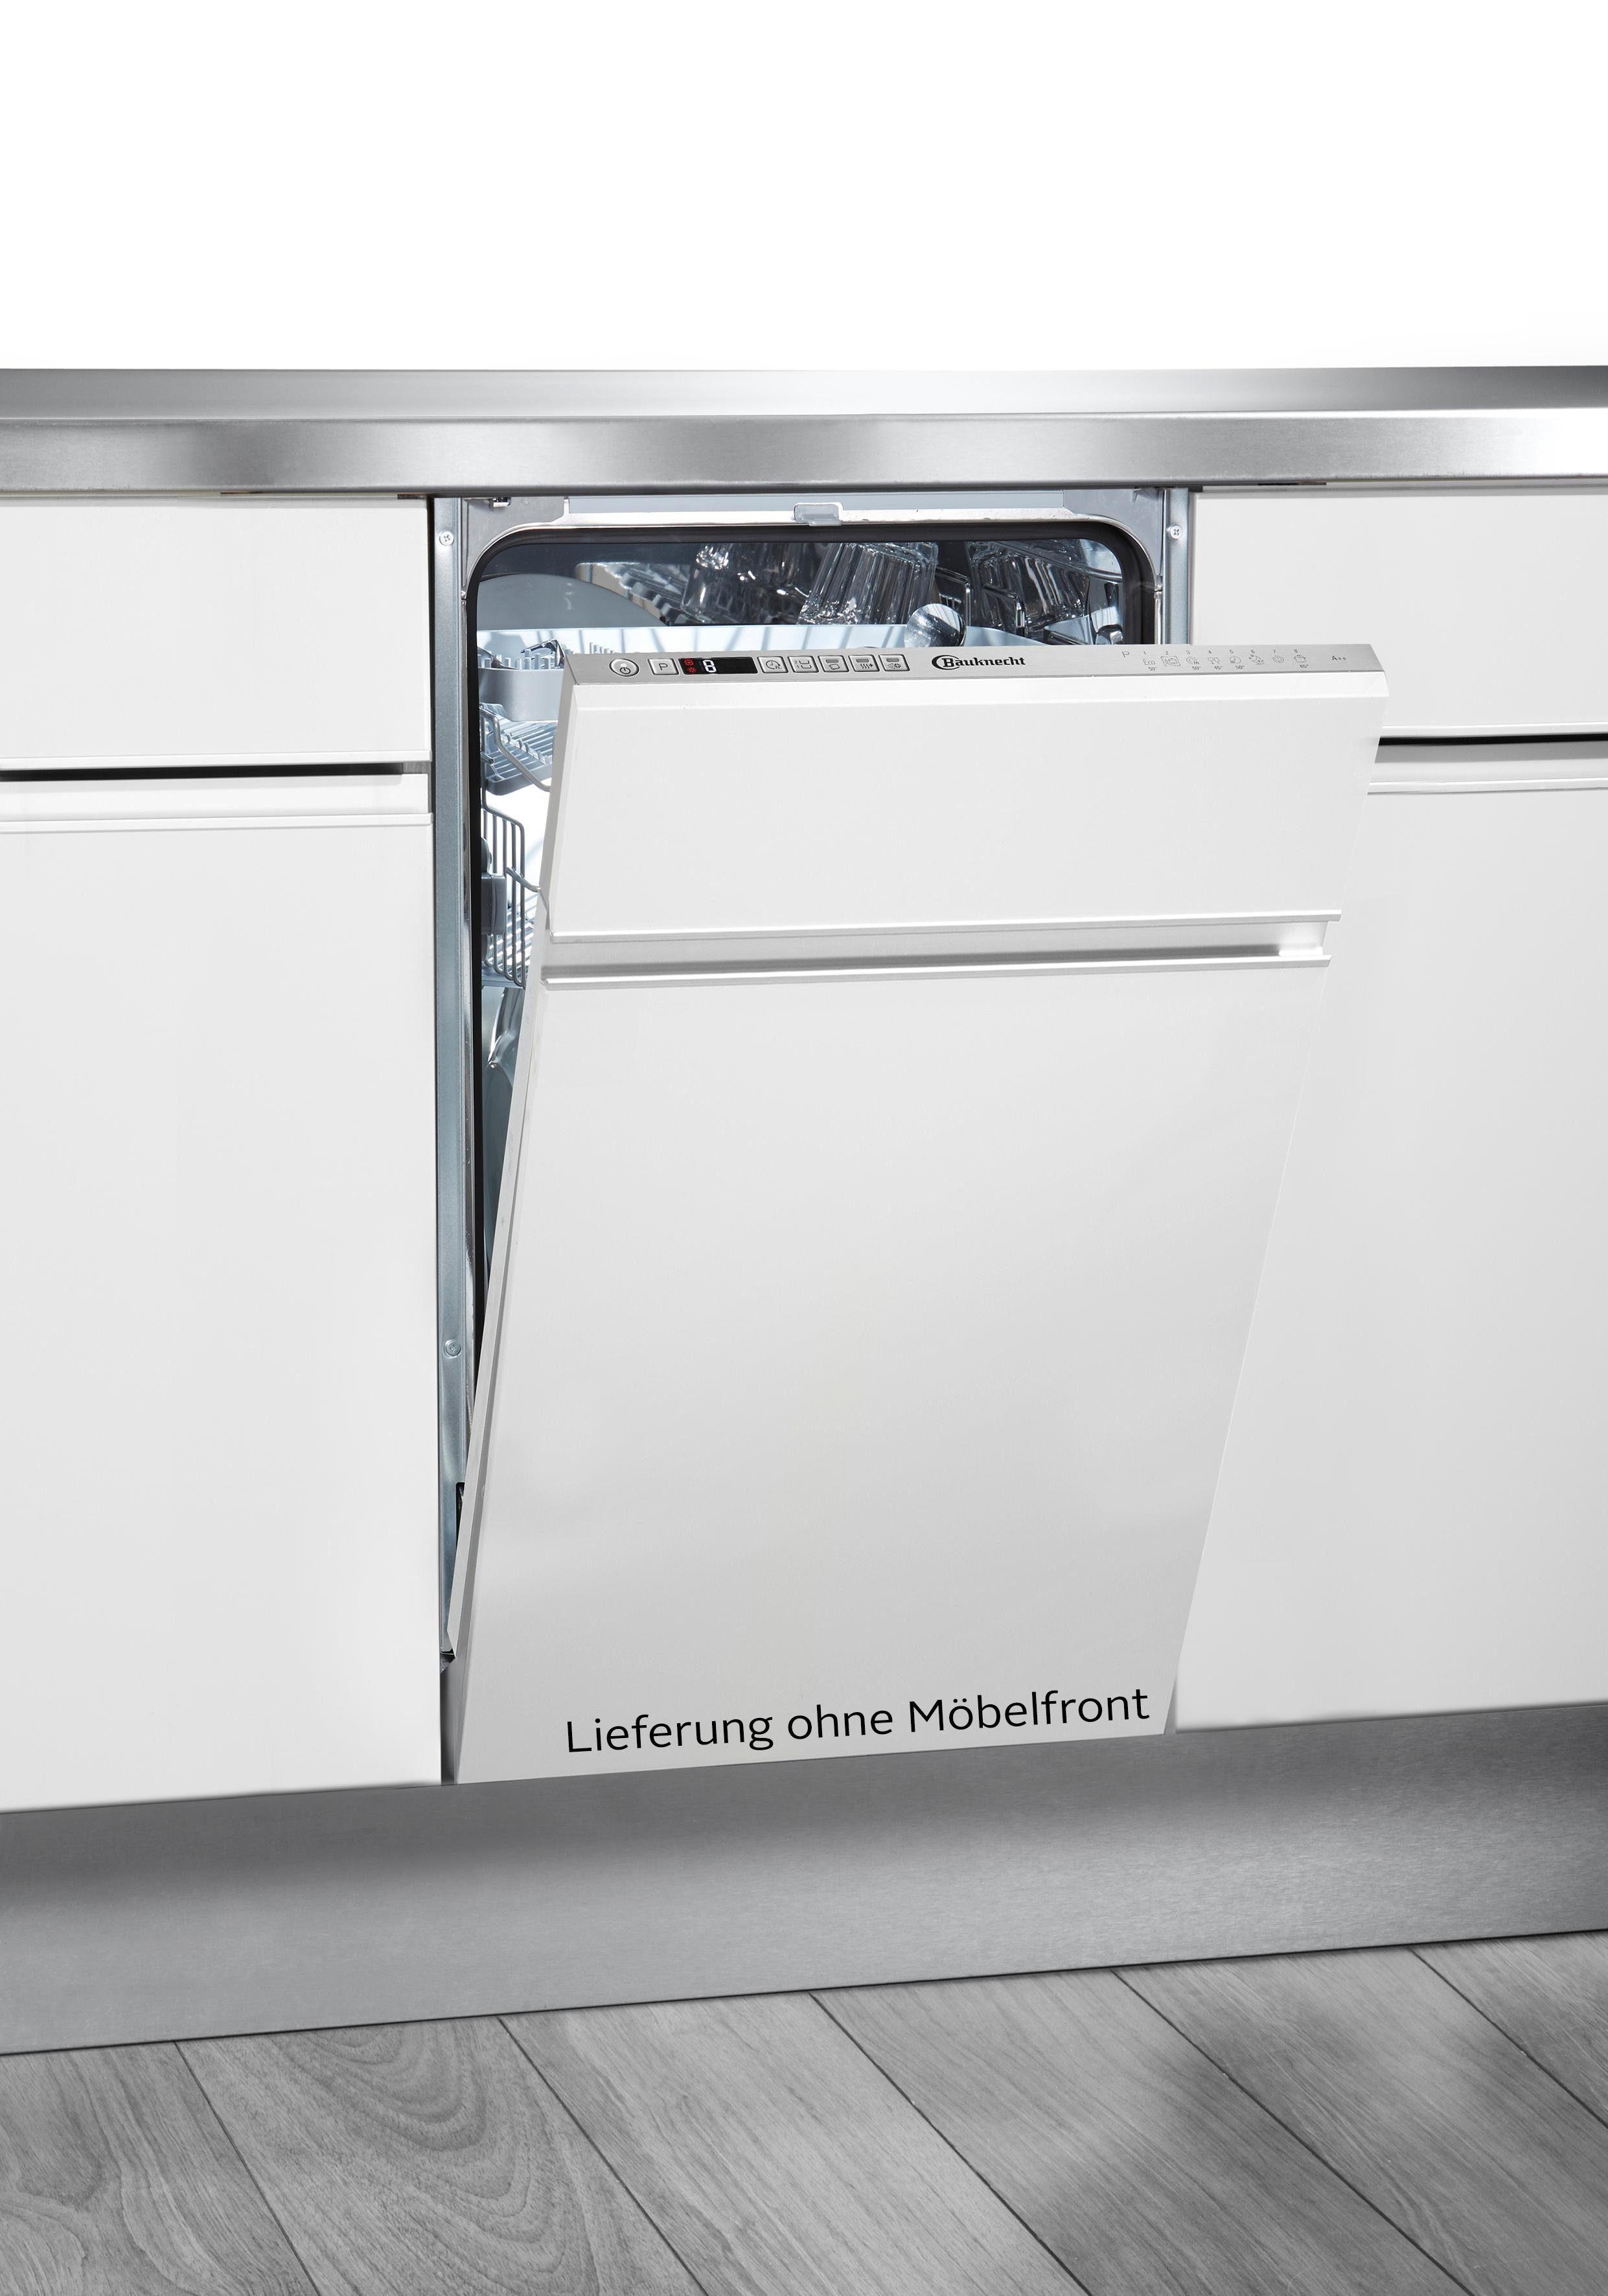 BAUKNECHT vollintegrierbarer Geschirrspüler, GCX 825, 9 l, 10 Maßgedecke, 45 cm breit